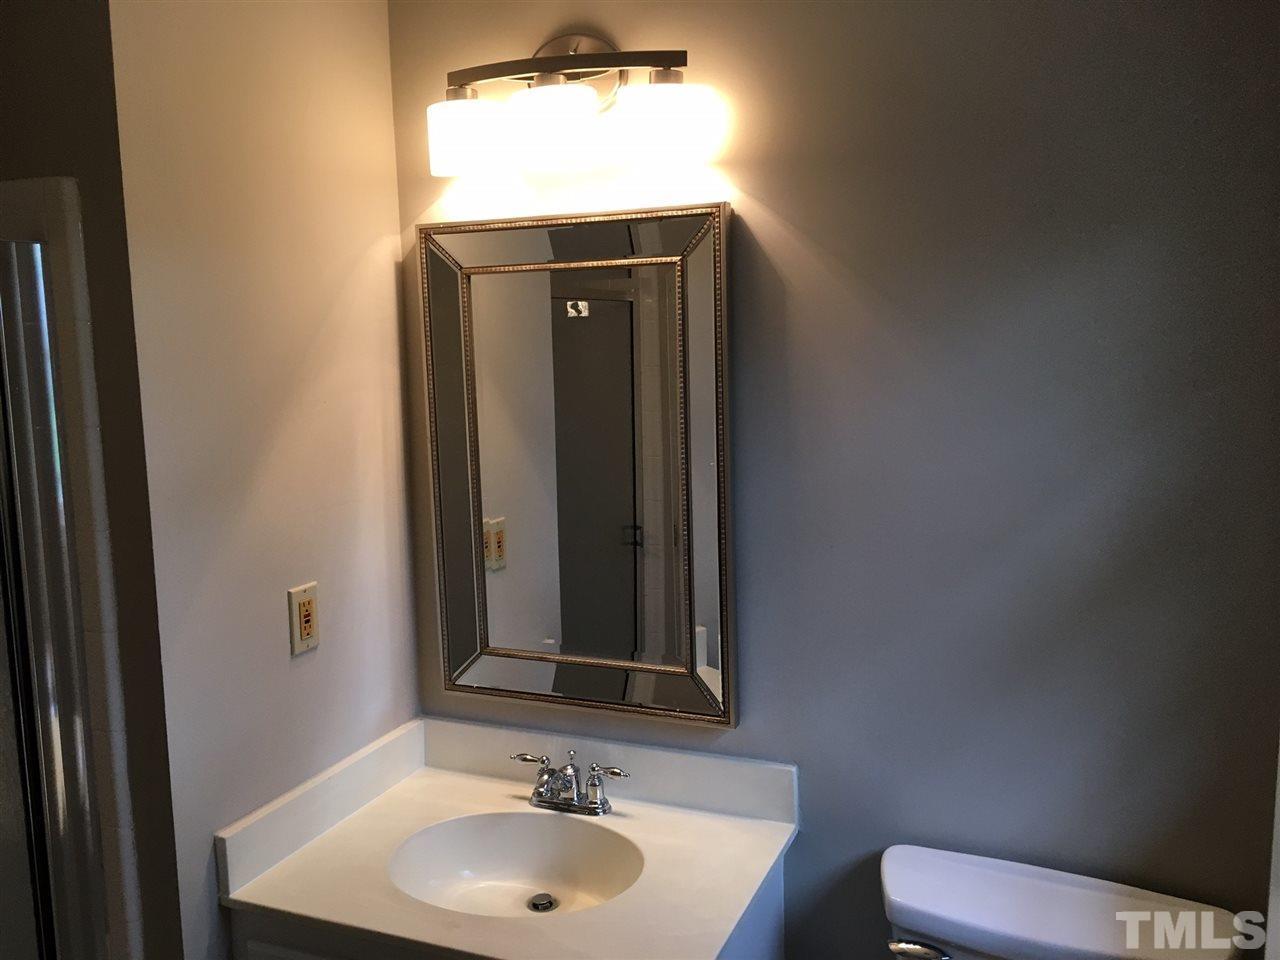 Bathroom Light Fixtures Raleigh Nc 2613 cottage cir, raleigh, nc 27613 mls# 2123794 - movoto